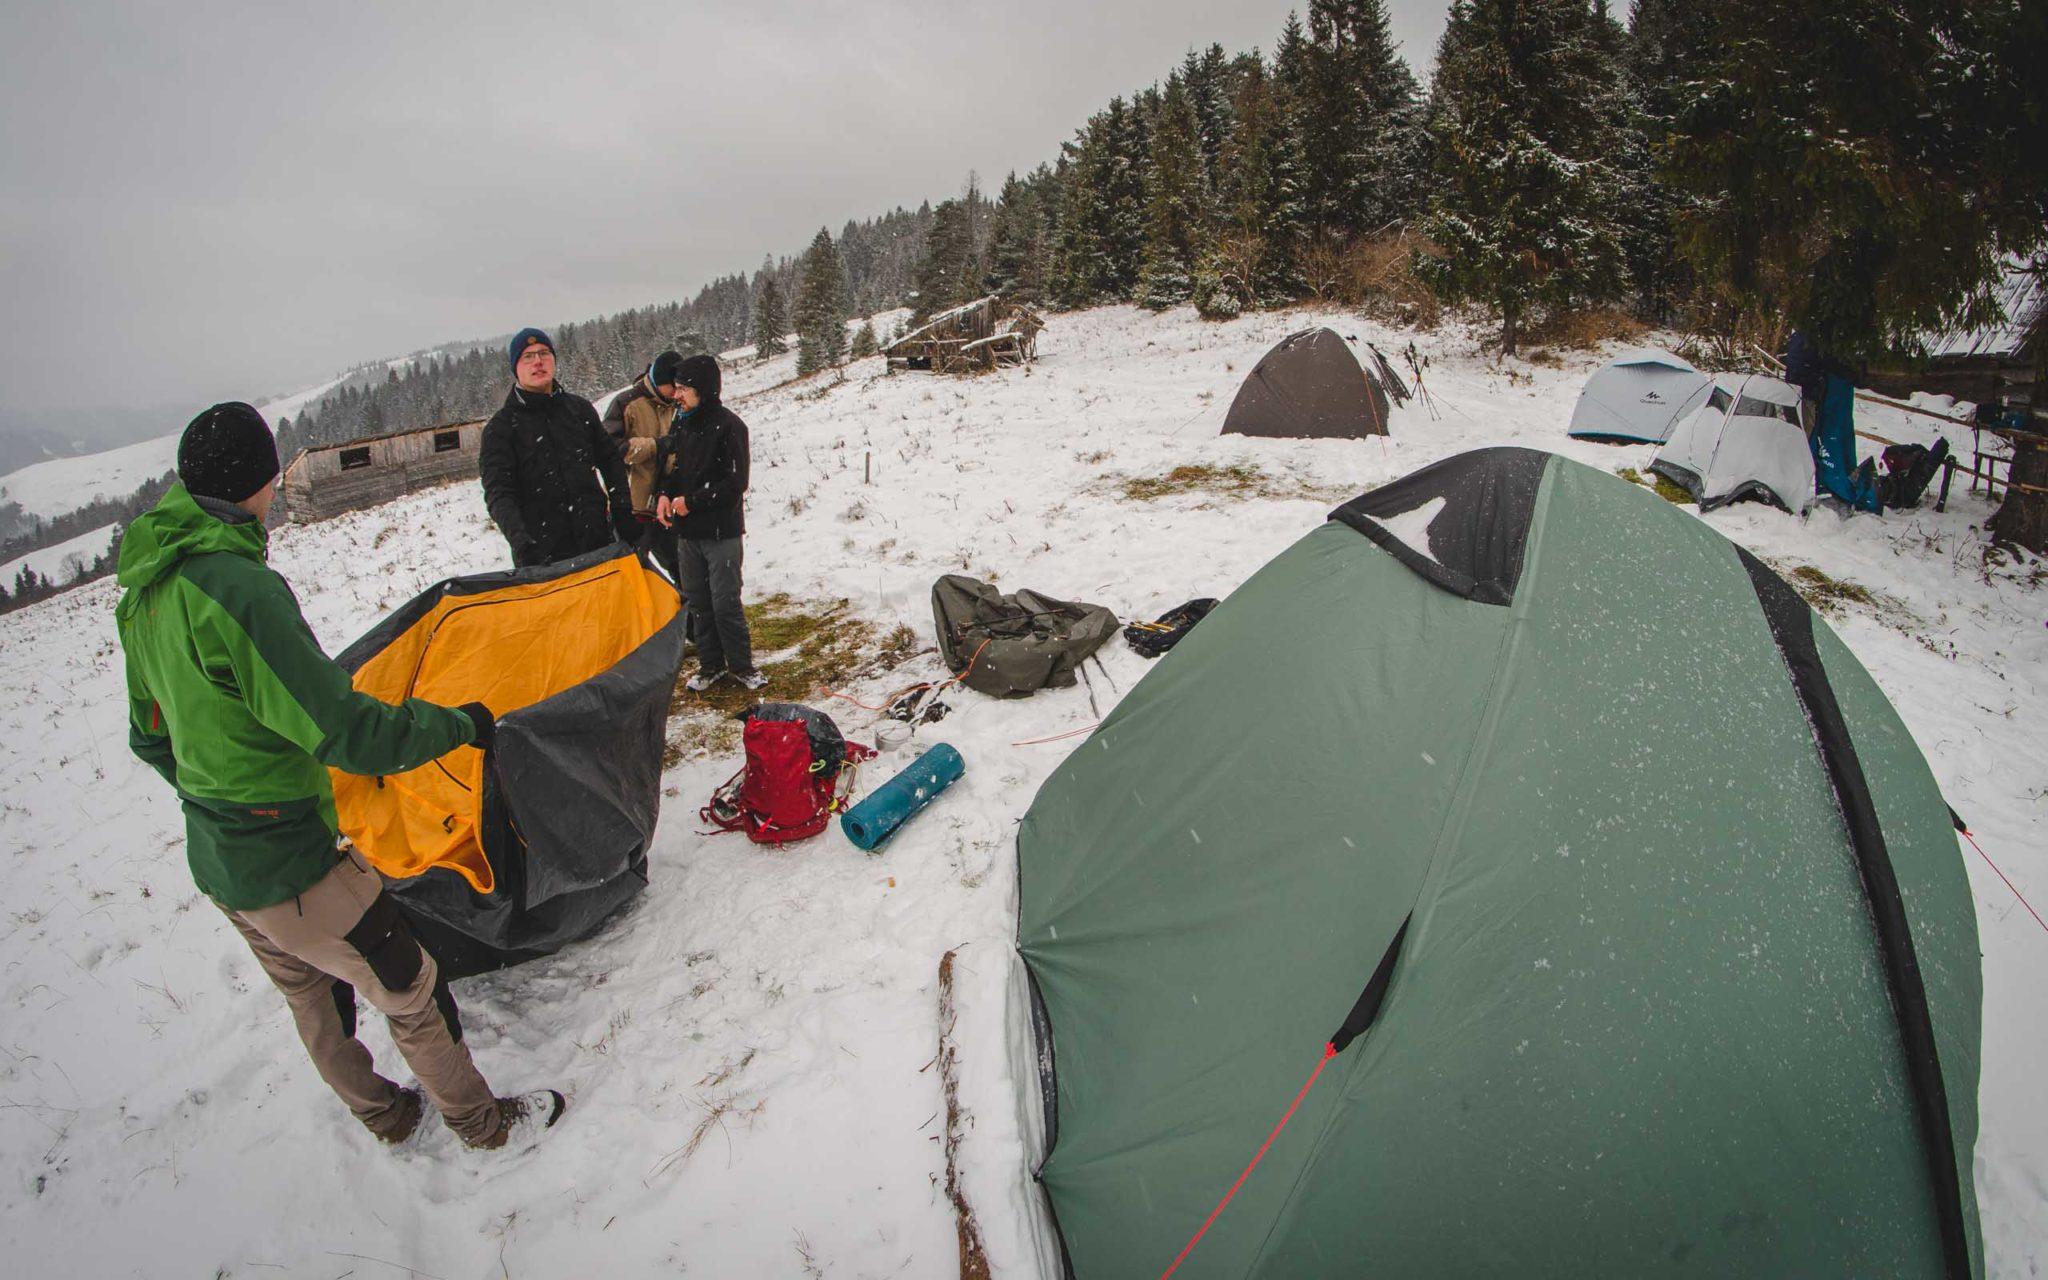 Grupa osób rozkłada namiot na śniegu